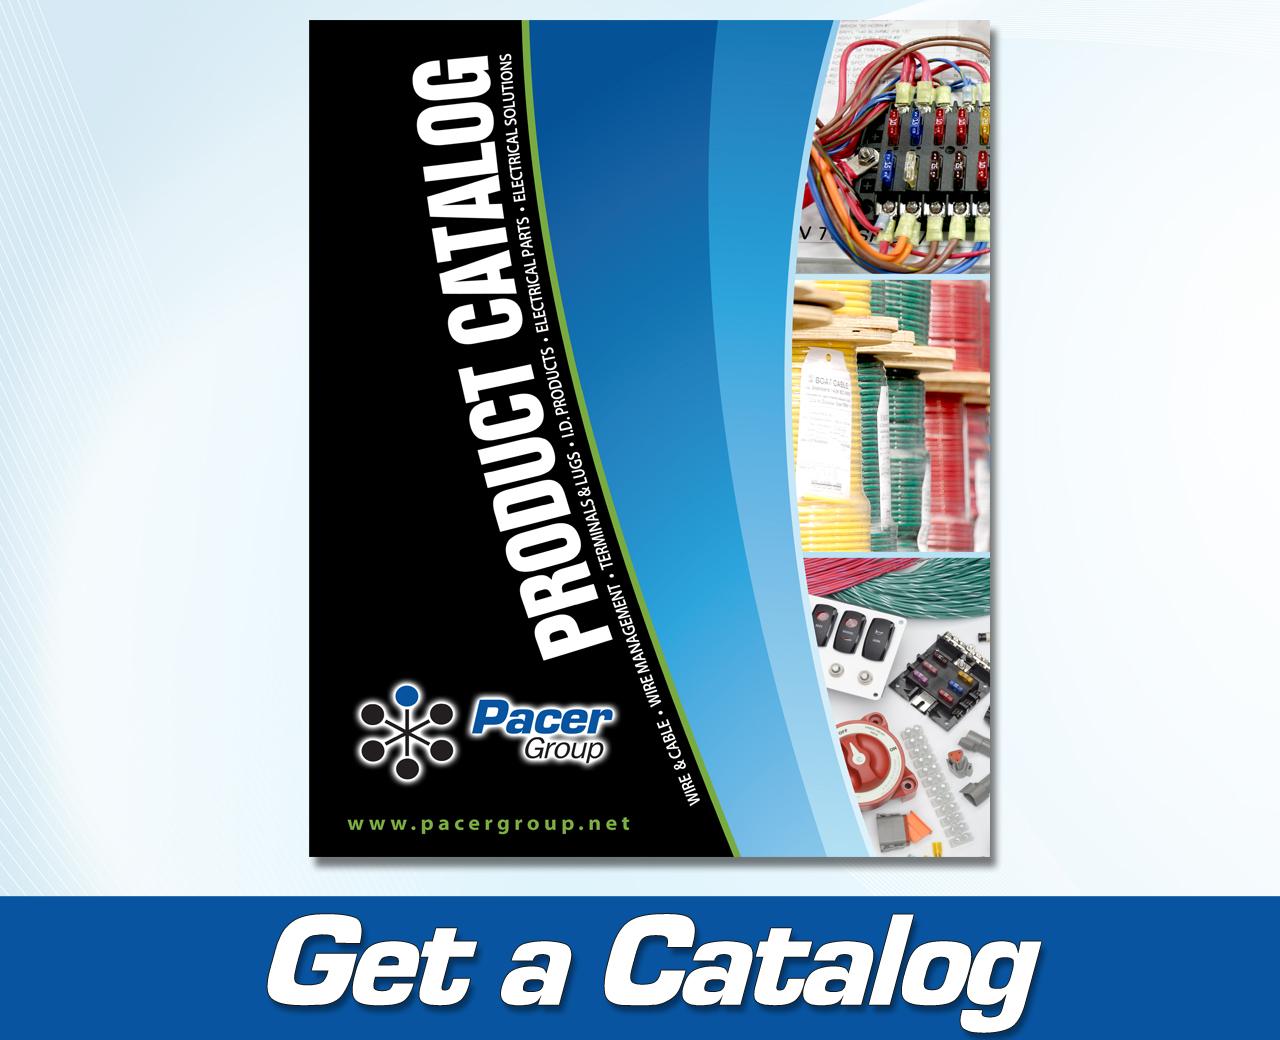 get-a-catalog2.jpg